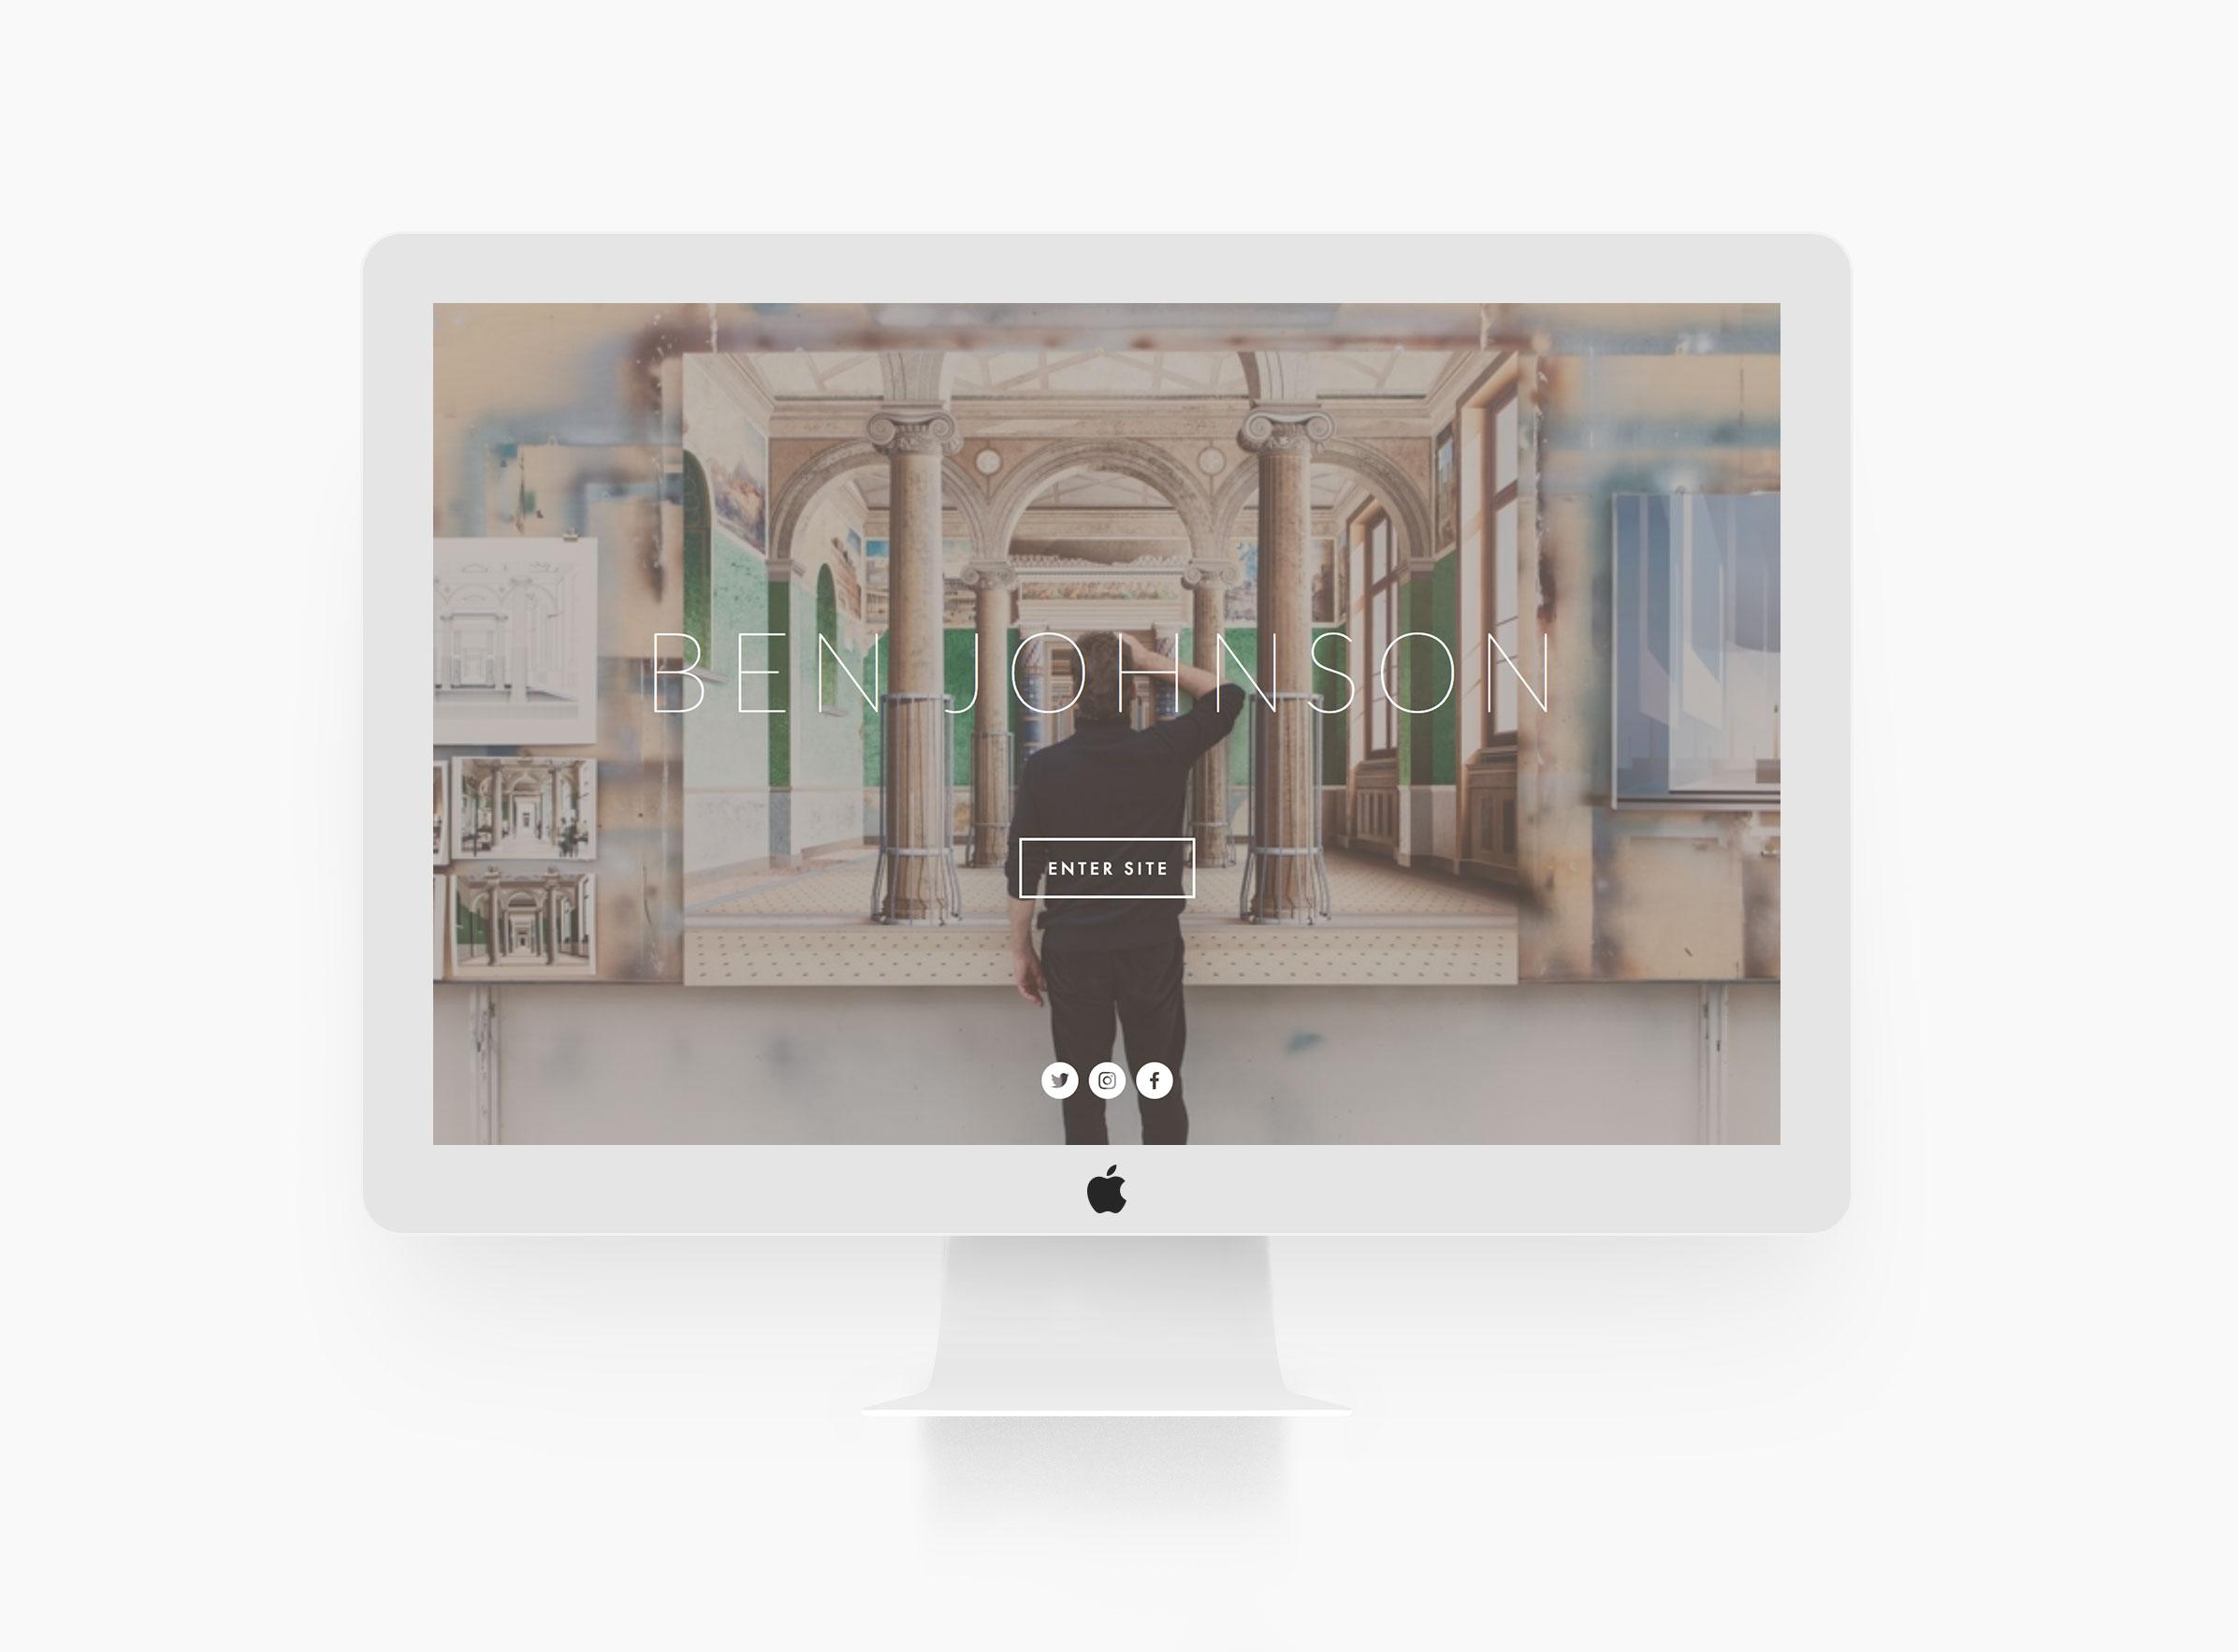 Ben-Johnson-Artist-website-design.jpg